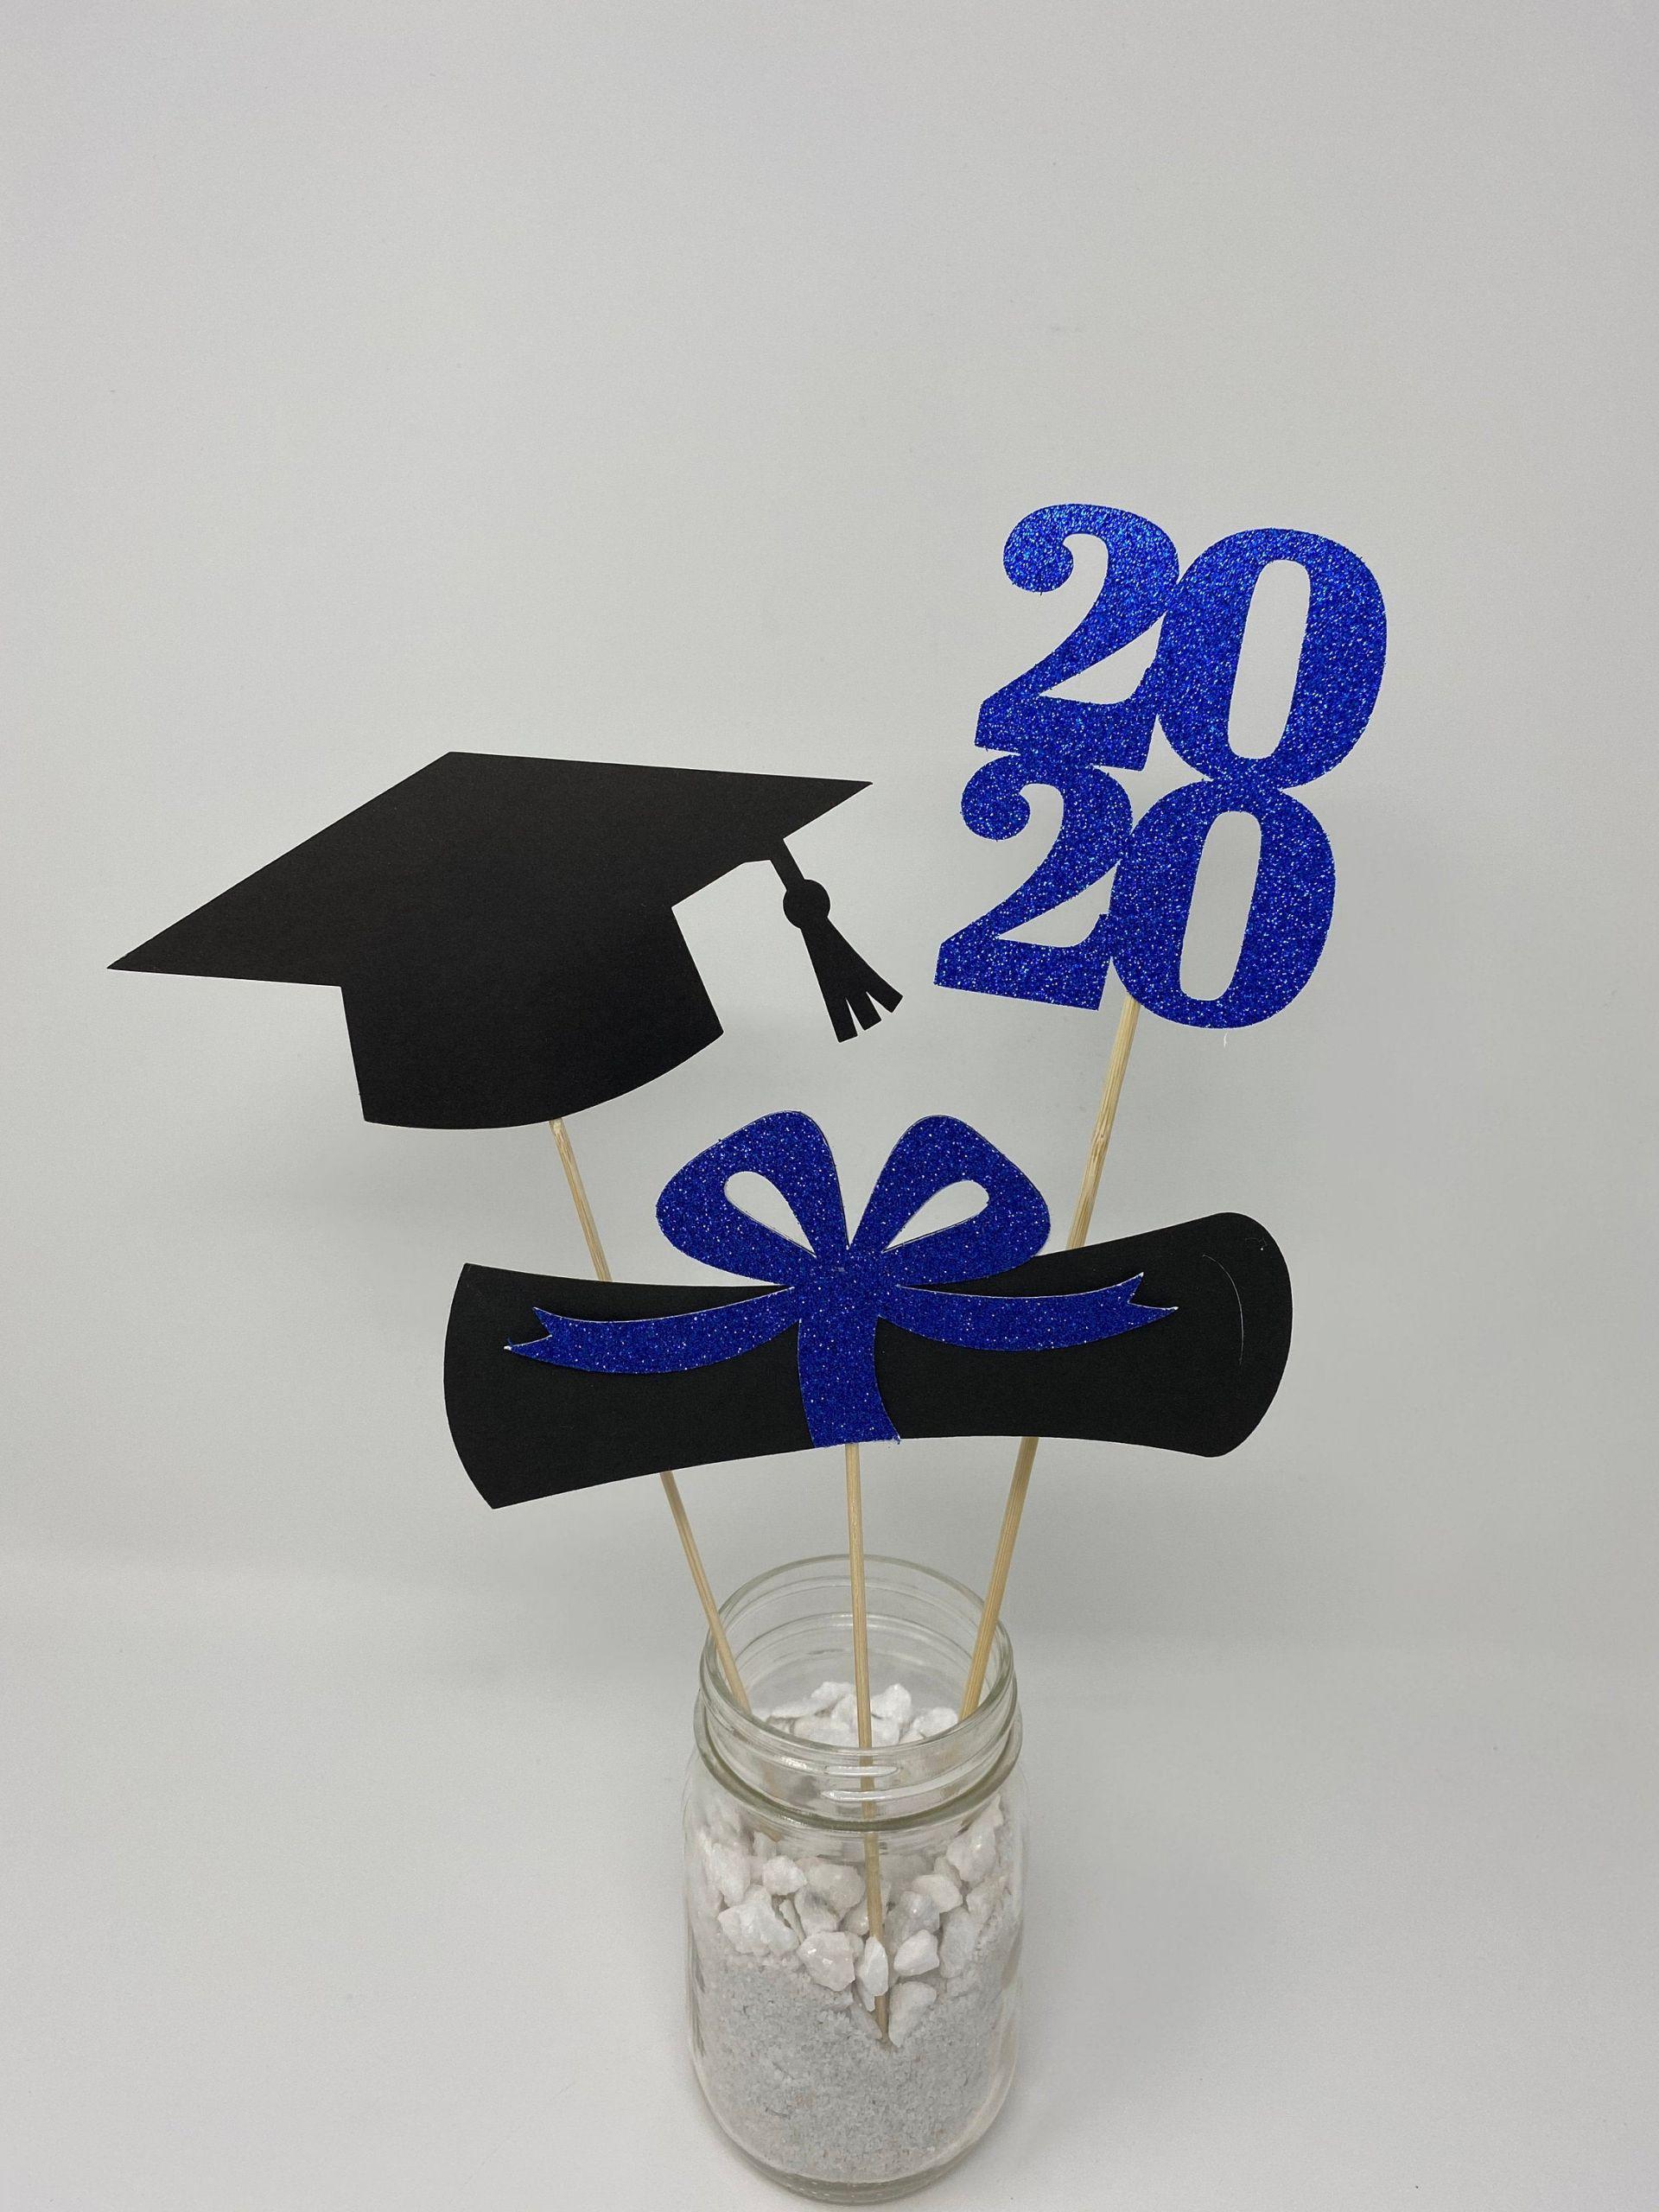 2020 Graduation Party Ideas  Graduation party decorations 2020 grad Graduation